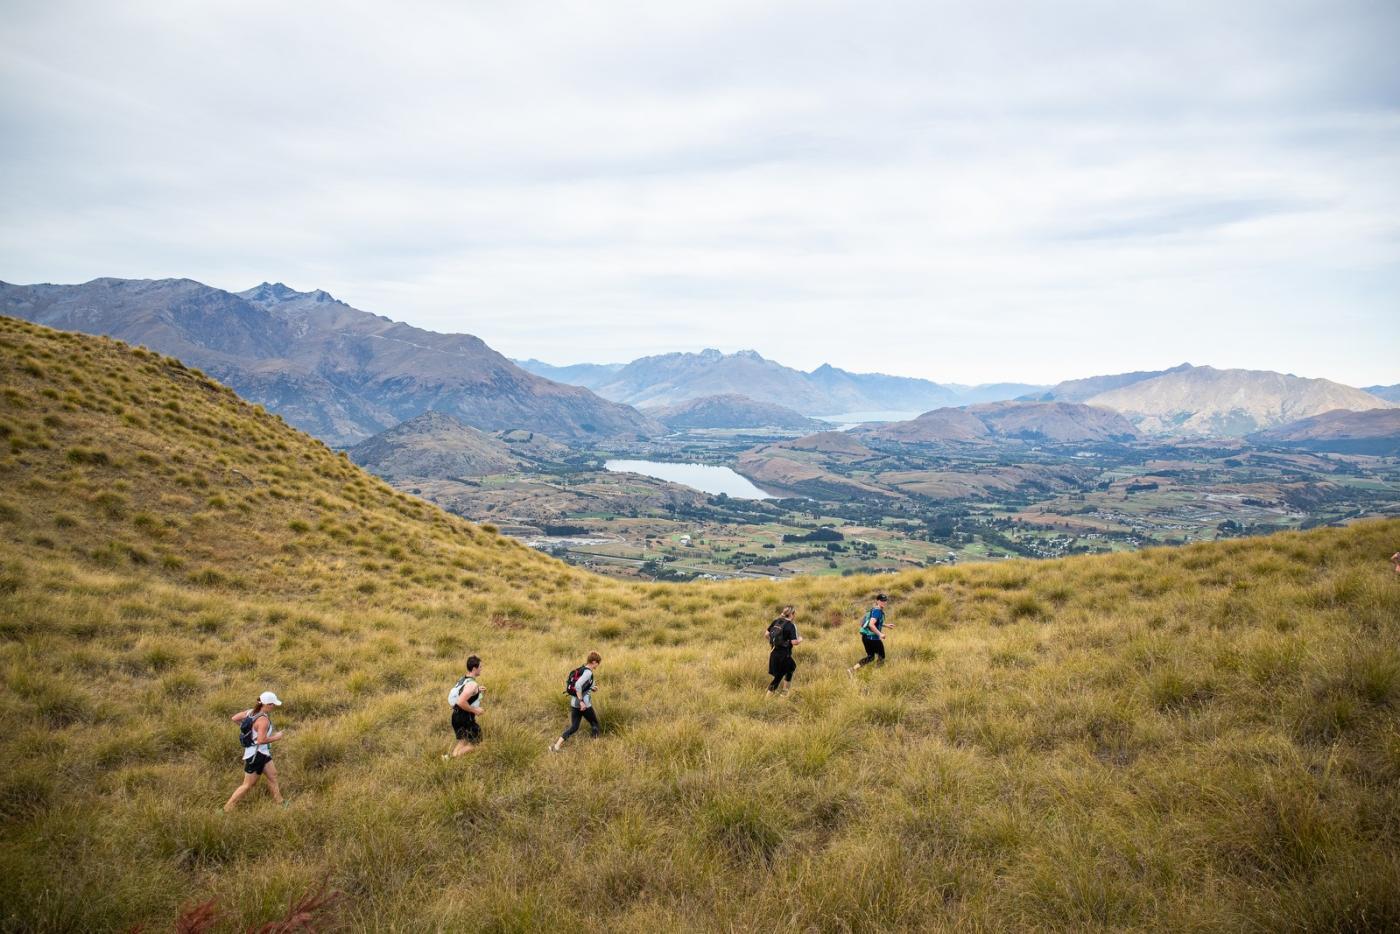 Macpac Motatapu Miners Trail overlooking Wakatipu Basin